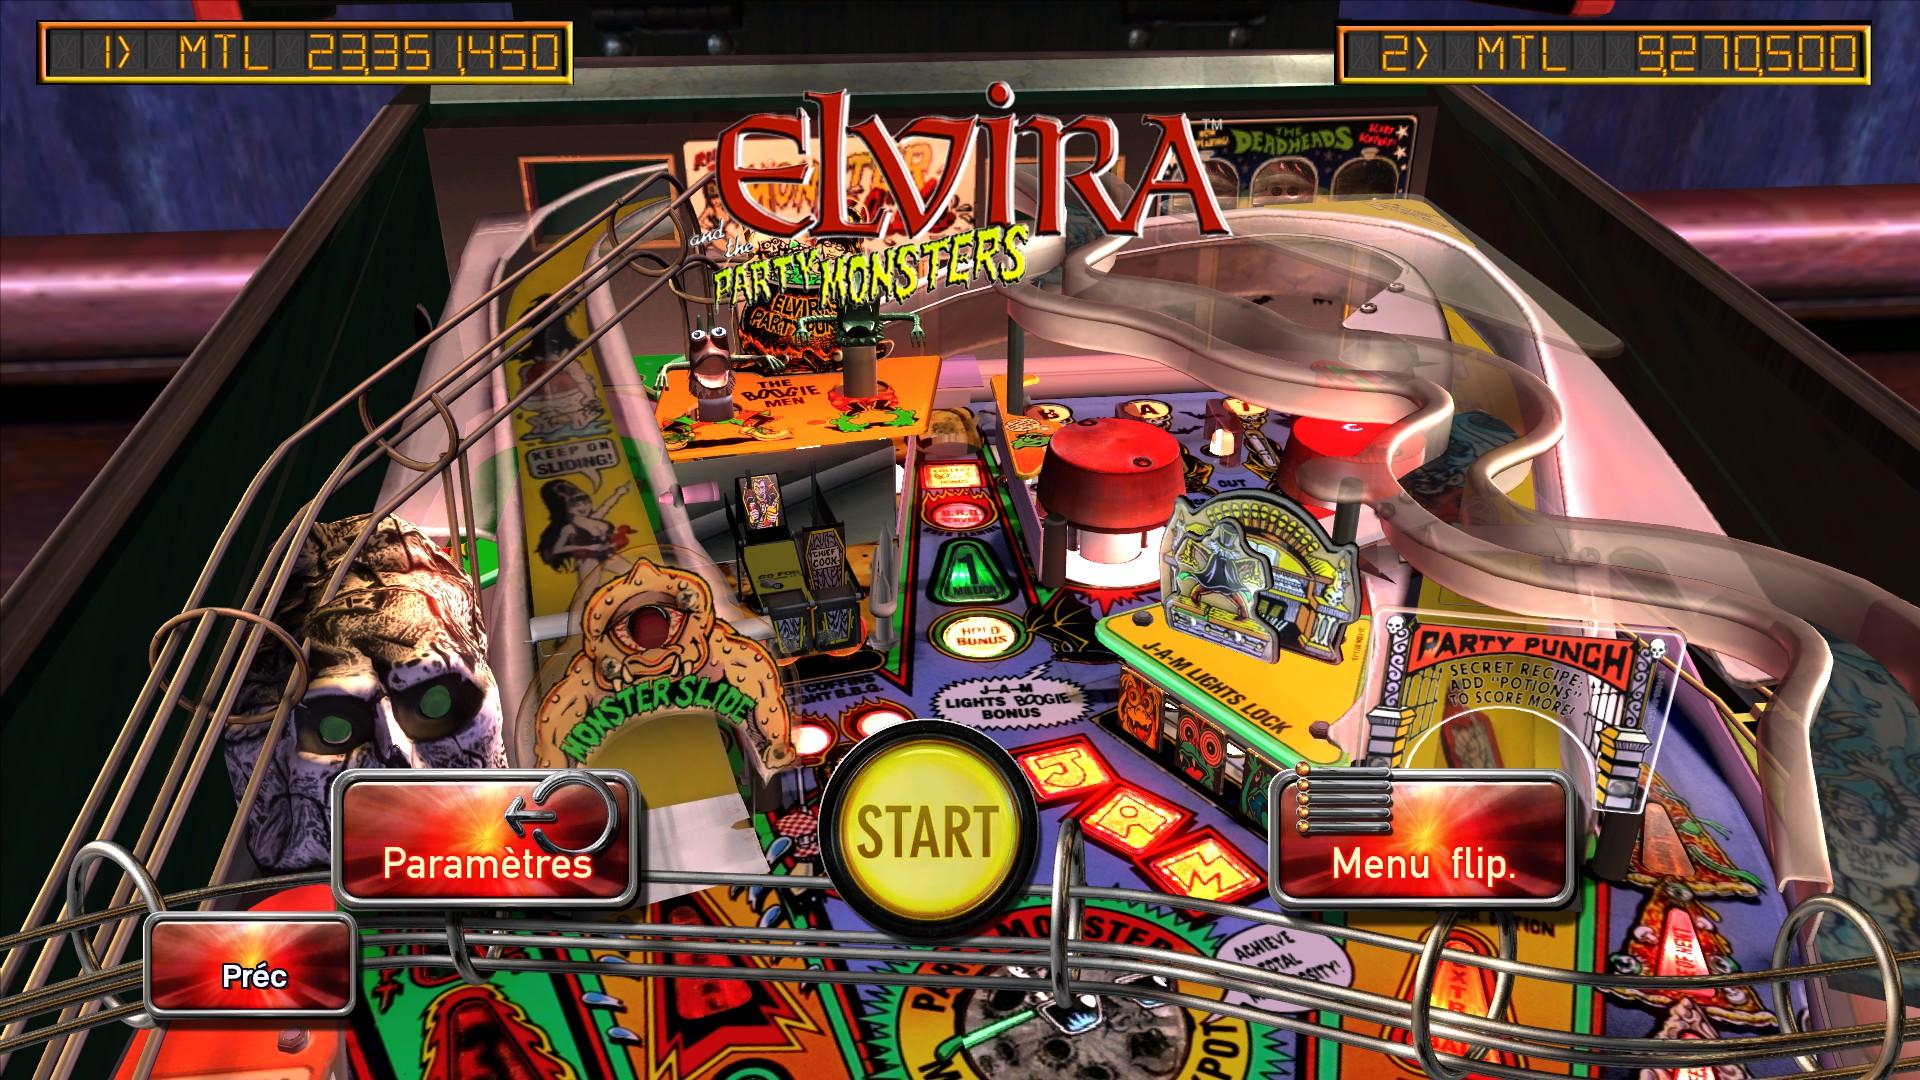 Mantalow: Pinball Arcade: Elvira (PC) 23,351,450 points on 2015-09-25 05:05:17